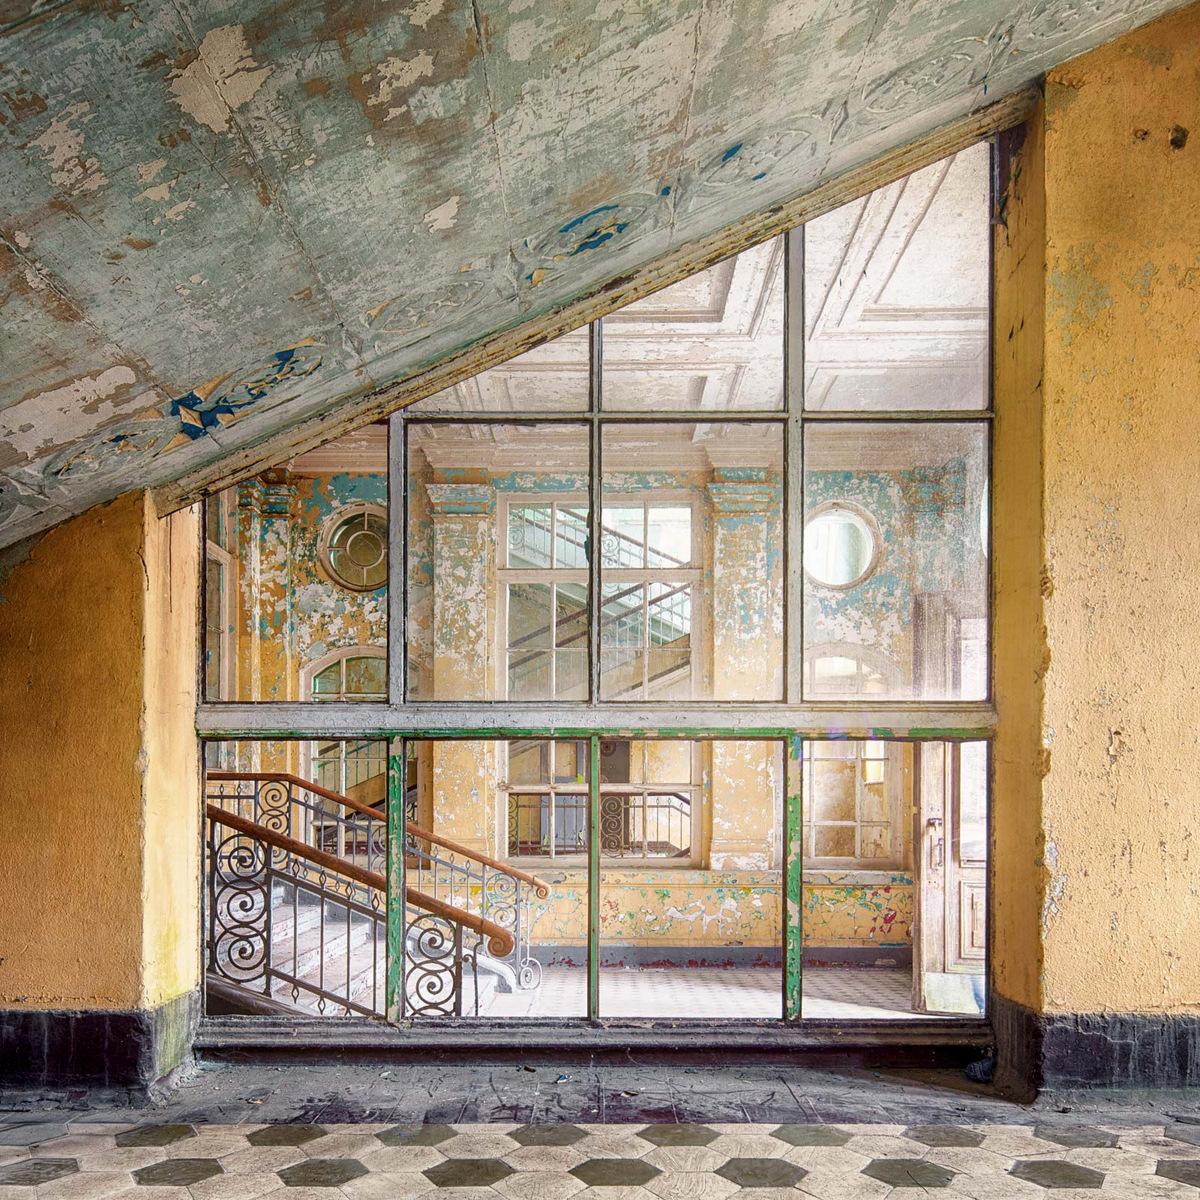 Decay series III by Markus Studtmann